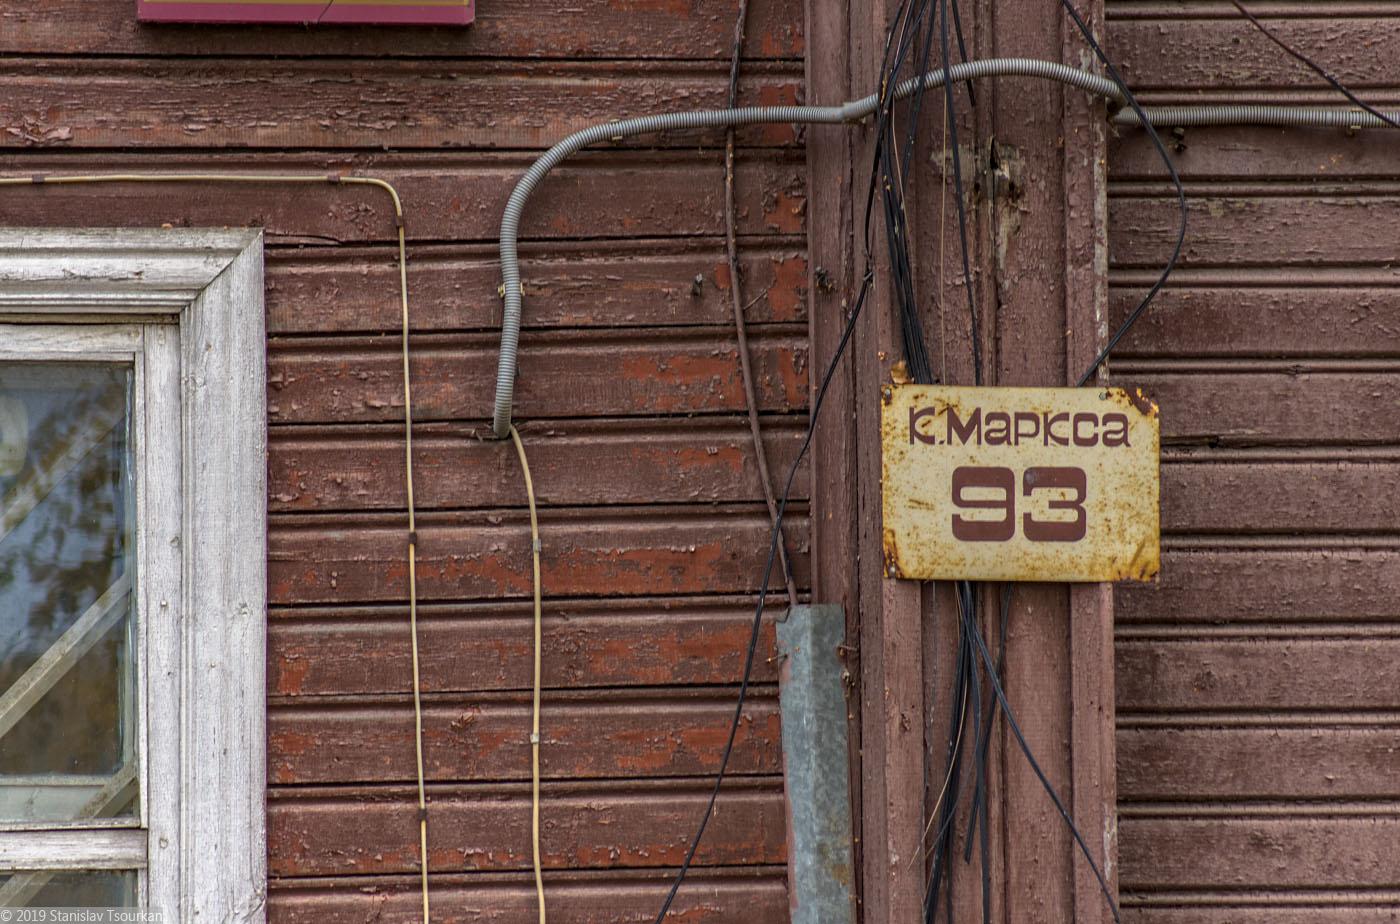 Весьегонск, улица Карла Маркса, 93, табличка, провода, дом